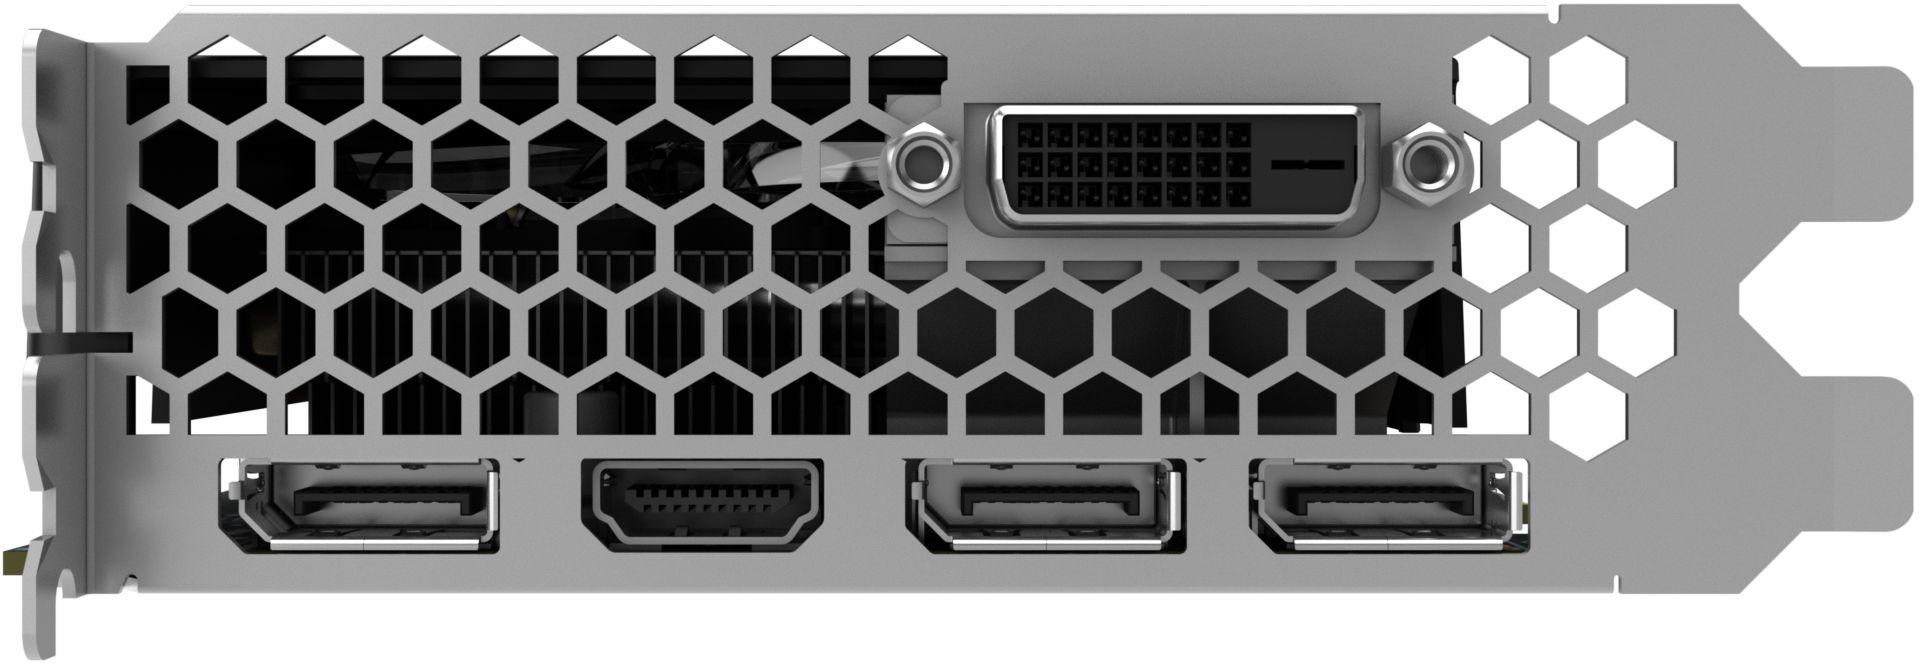 Geforce GTX 1070 DUAL 8GB GDDR5, NE51070015P2-1043D